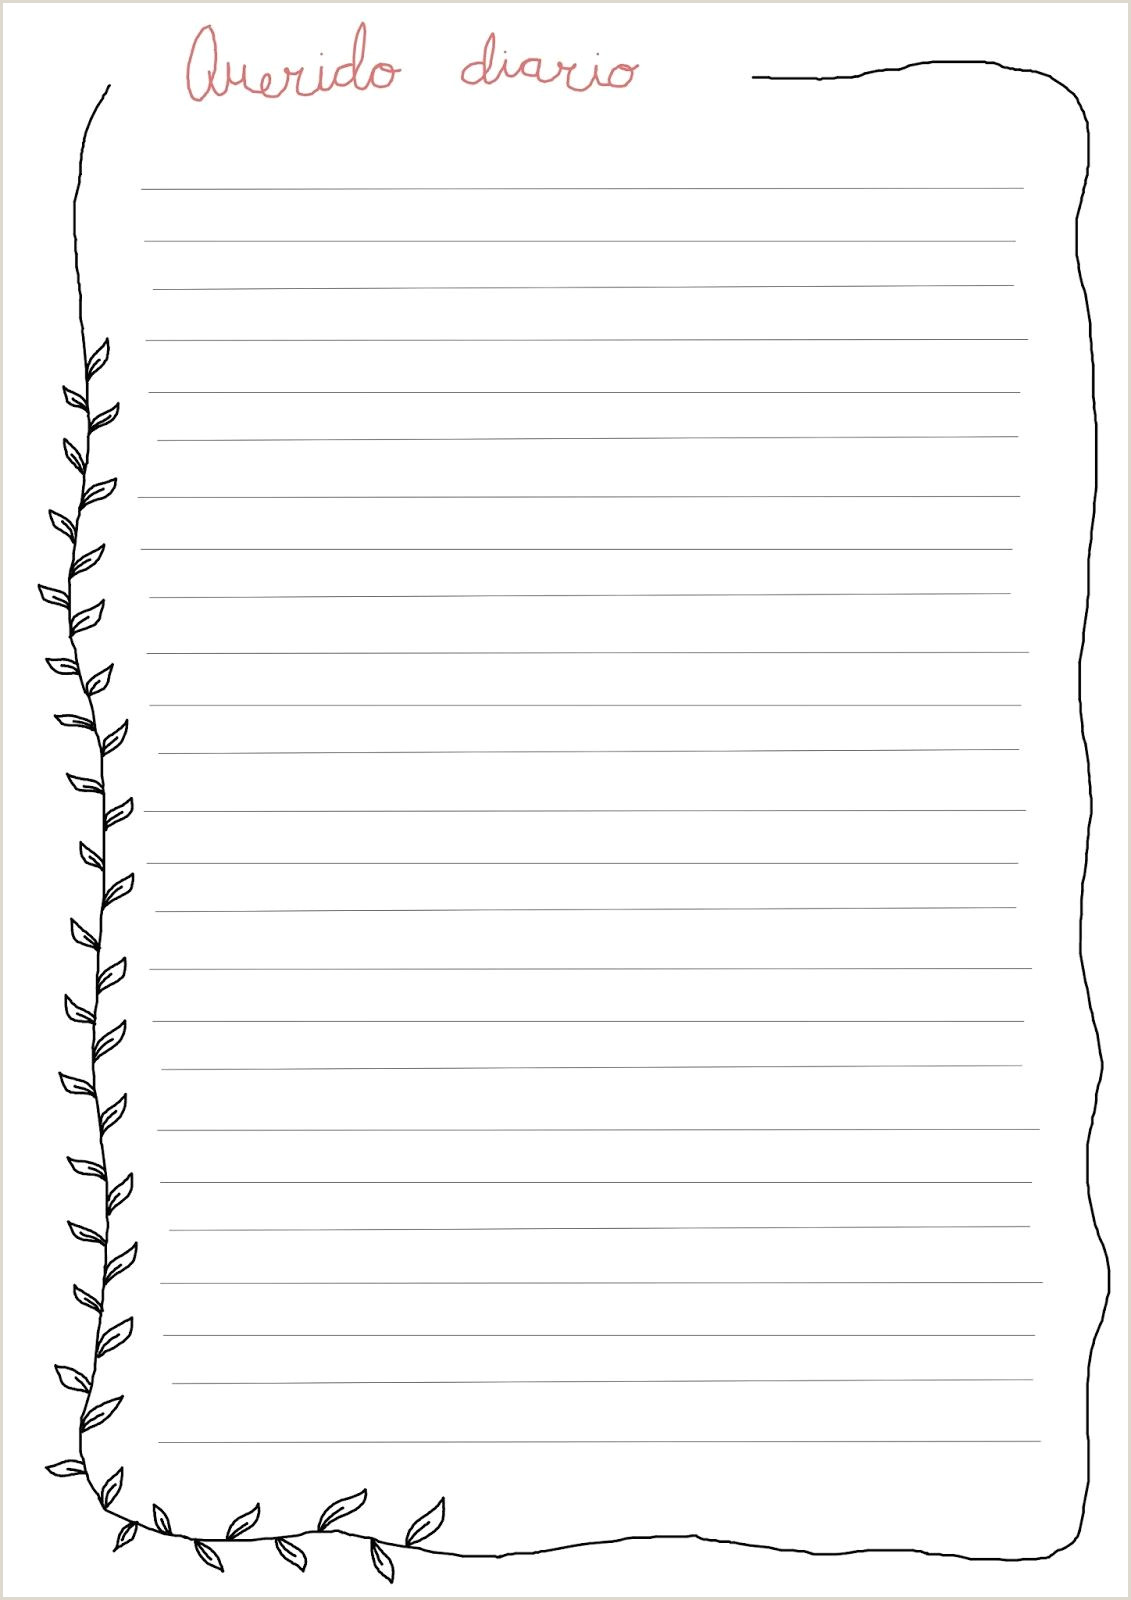 Diario personal para descargar gratis Imprimibles gratis